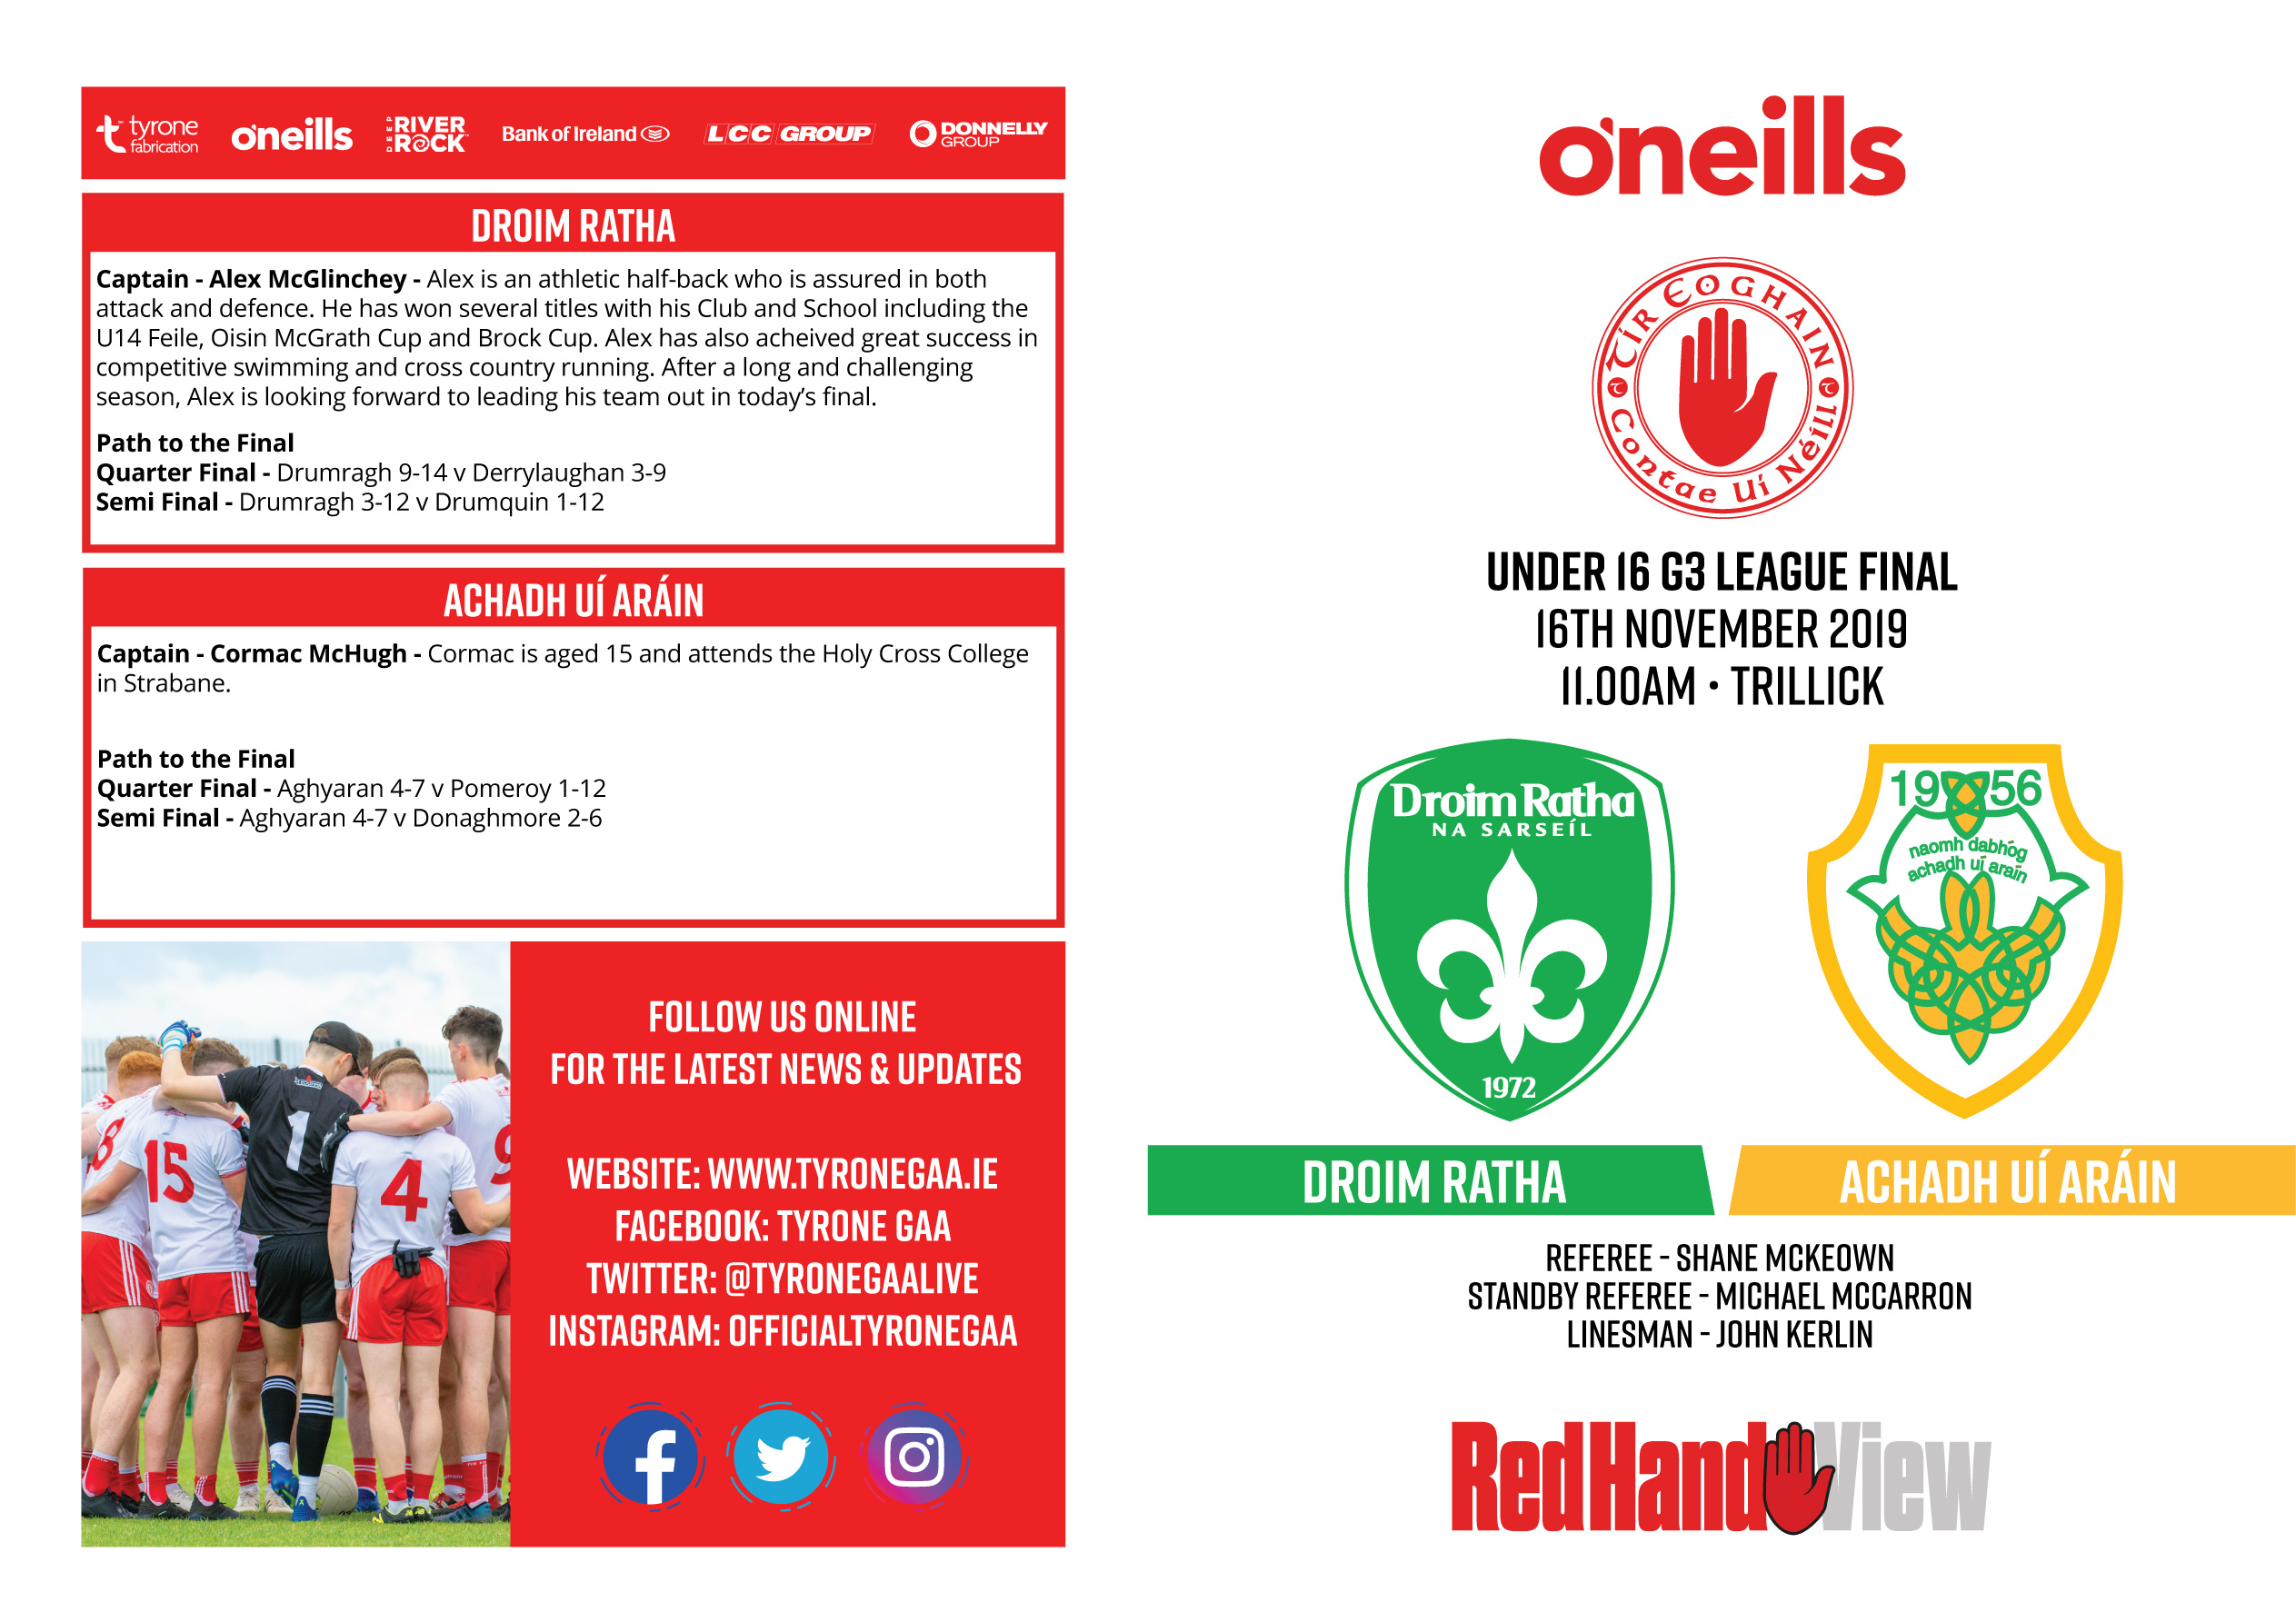 Under 16 League Final Programme